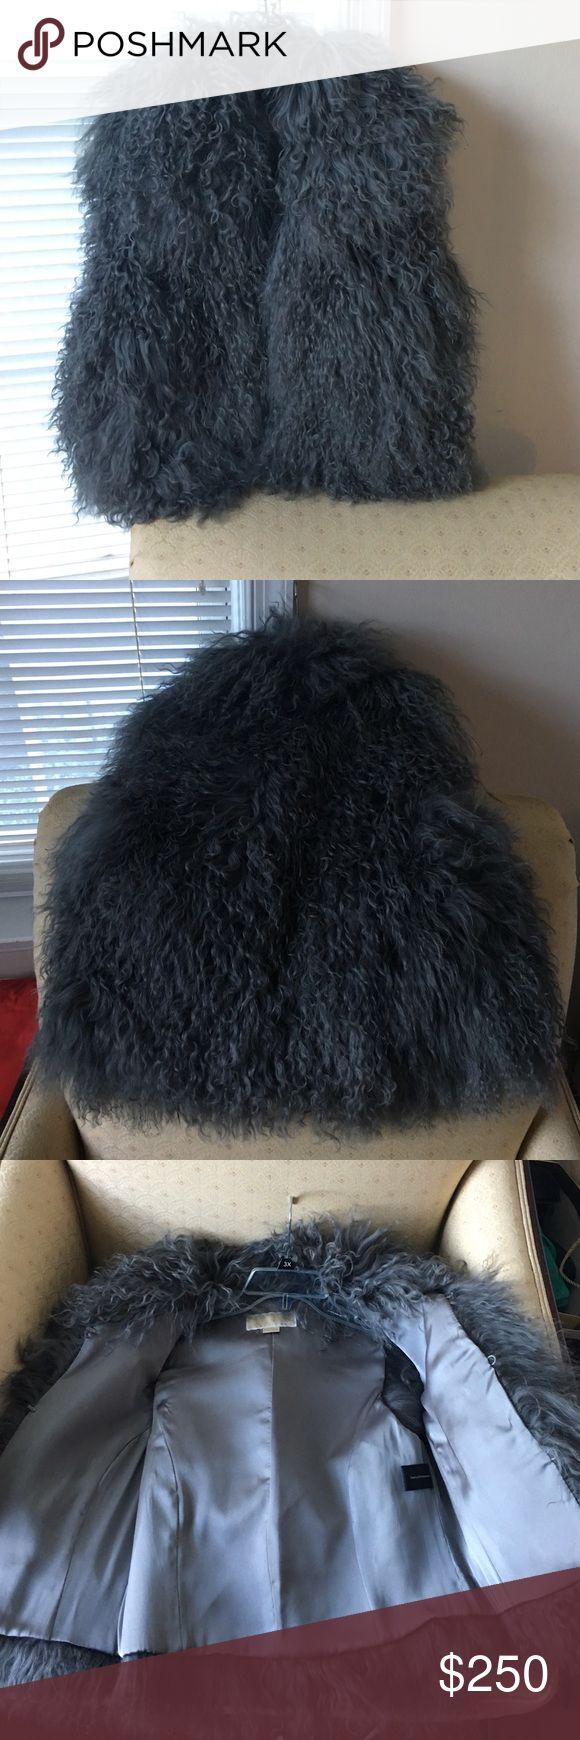 Michael Kors real fur vest size S Michael Kors real fur vest size S. Has two pockets.Wore only once. In excellent condition👌I take reasonable offers😊 Michael Kors Jackets & Coats Vests